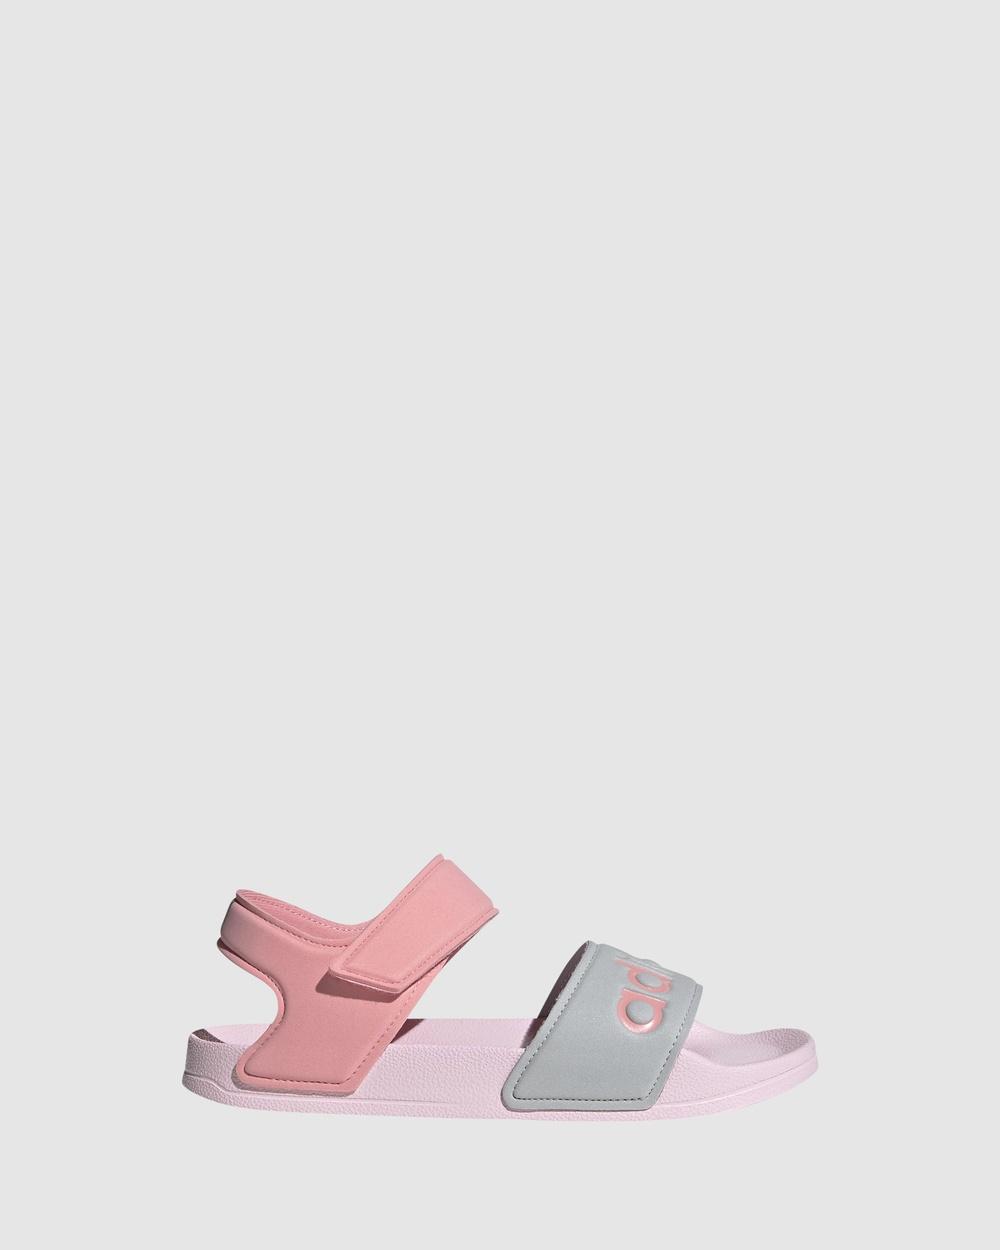 adidas Performance Adilette Sandal K Sandals Pink/Silver